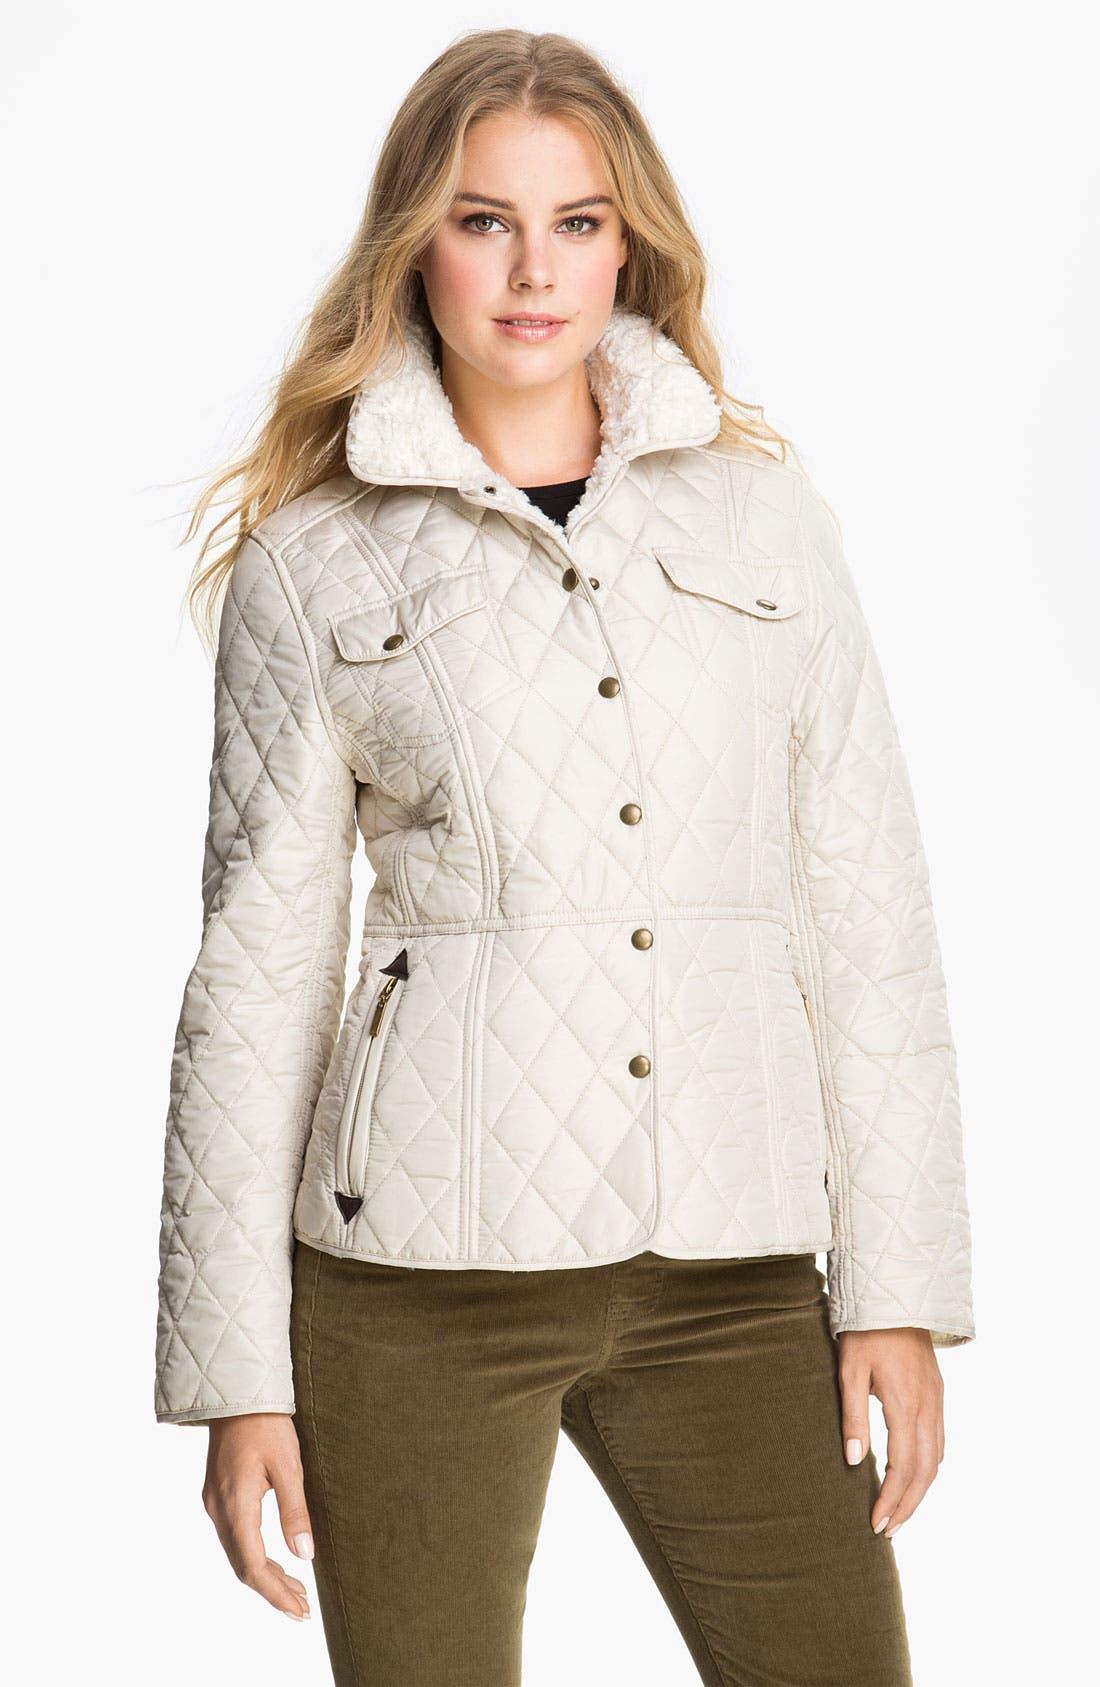 Alternate Image 1 Selected - Weatherproof® Faux Fur Lined Barn Jacket (Online Exclusive)